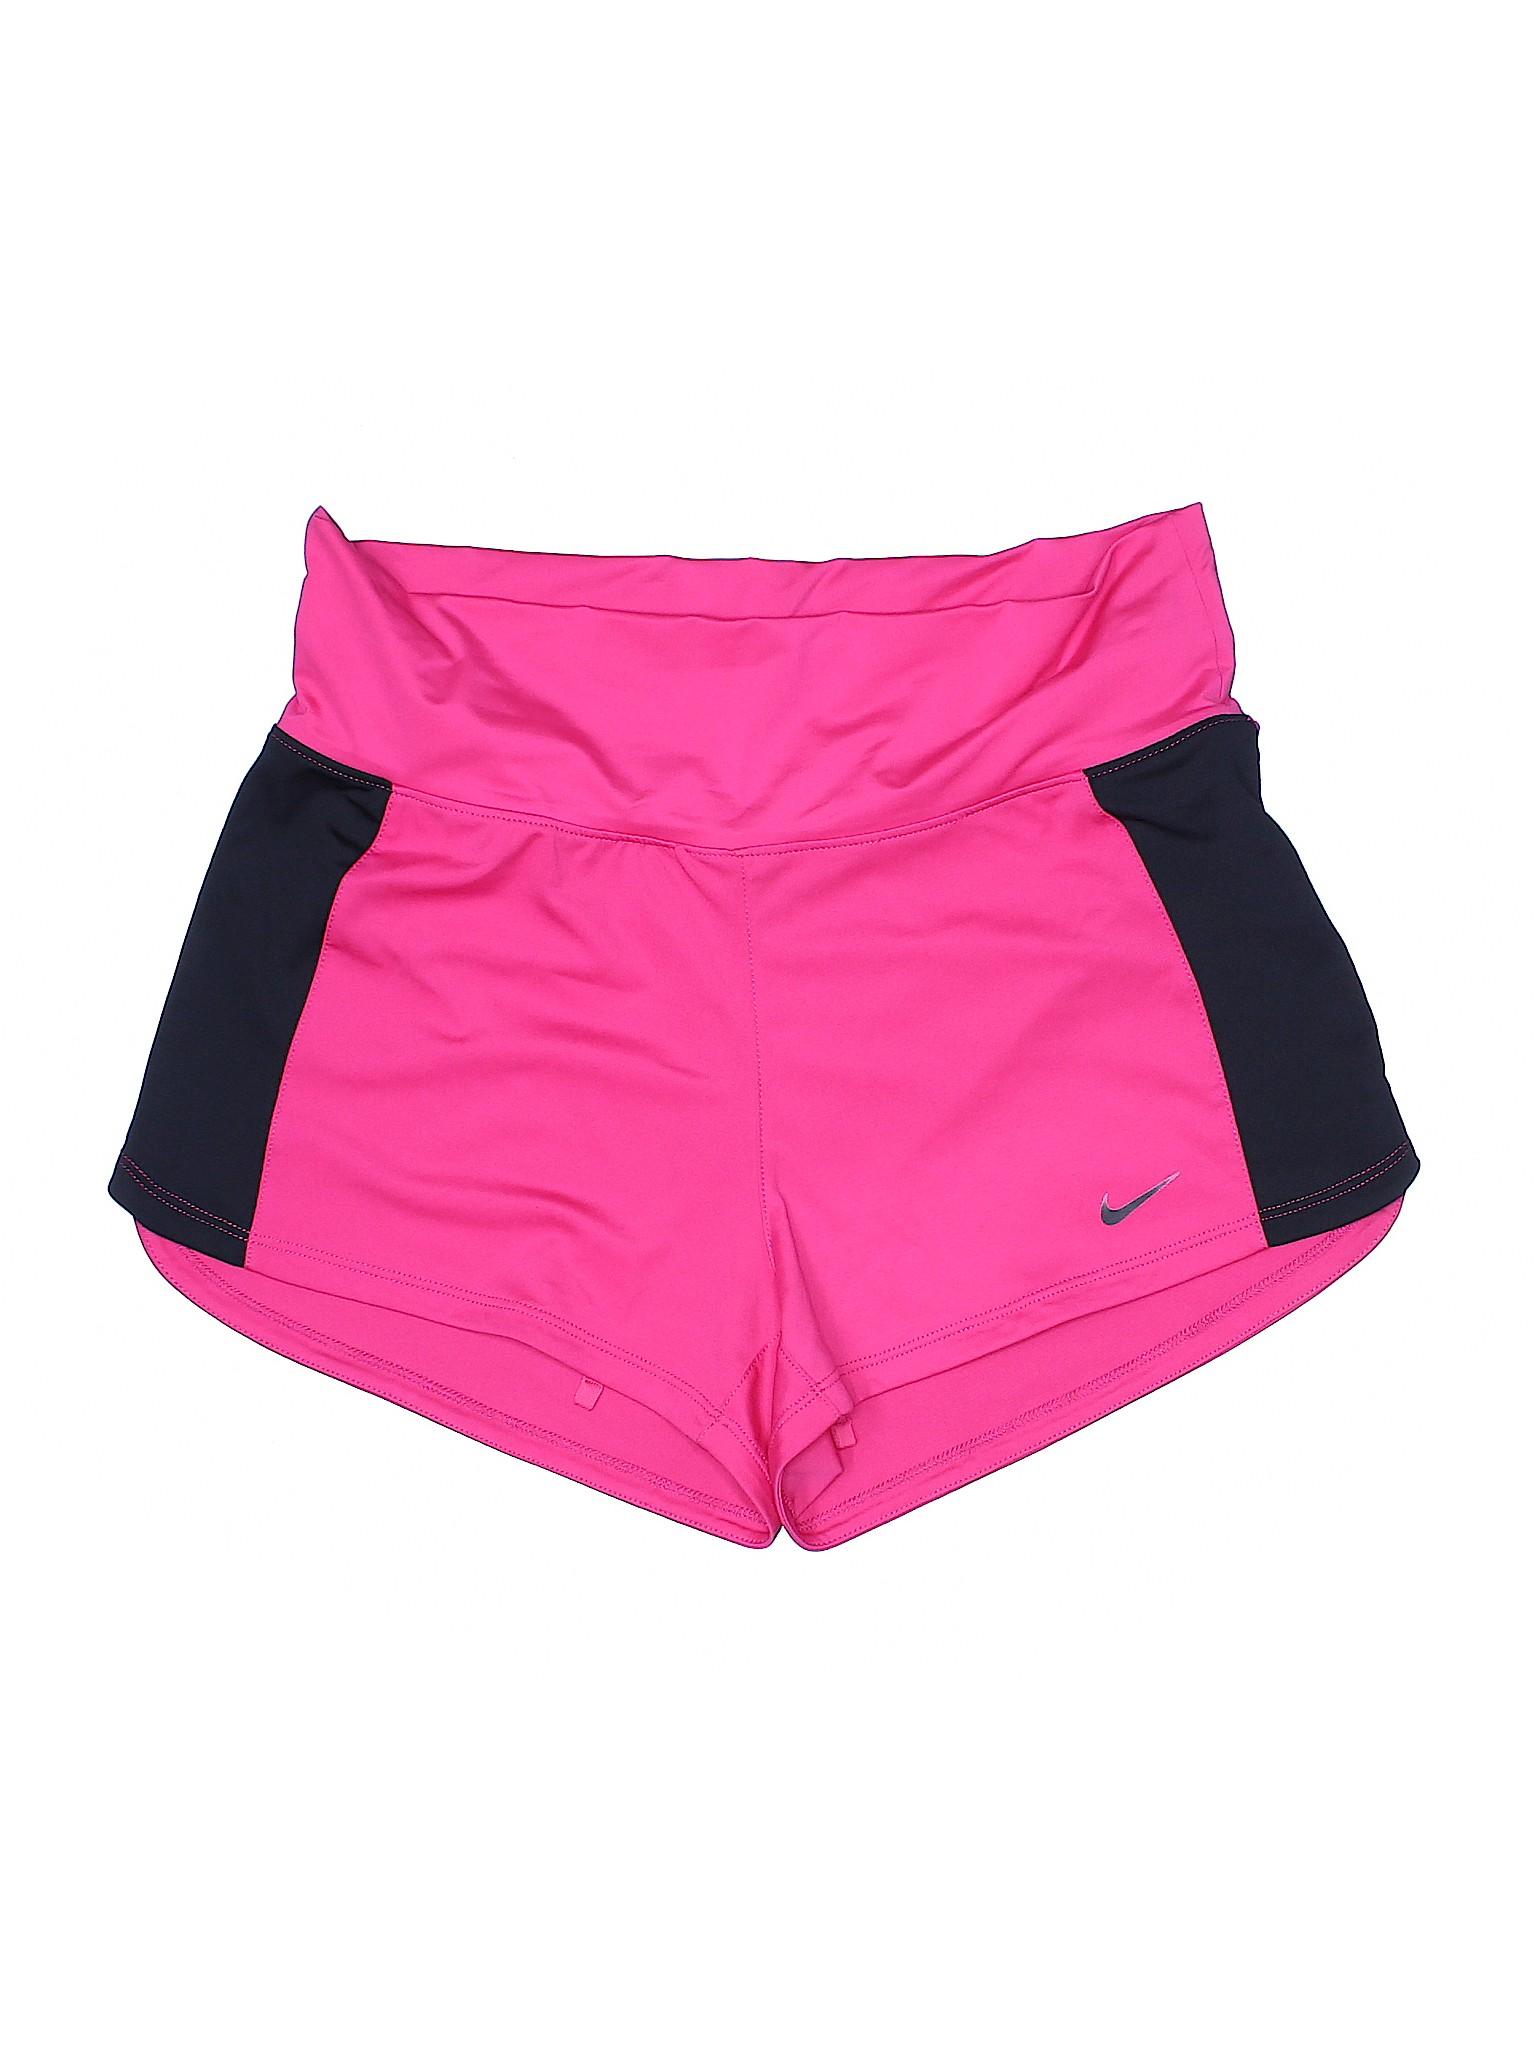 Boutique Boutique Nike Nike Shorts Athletic 6OBwxP